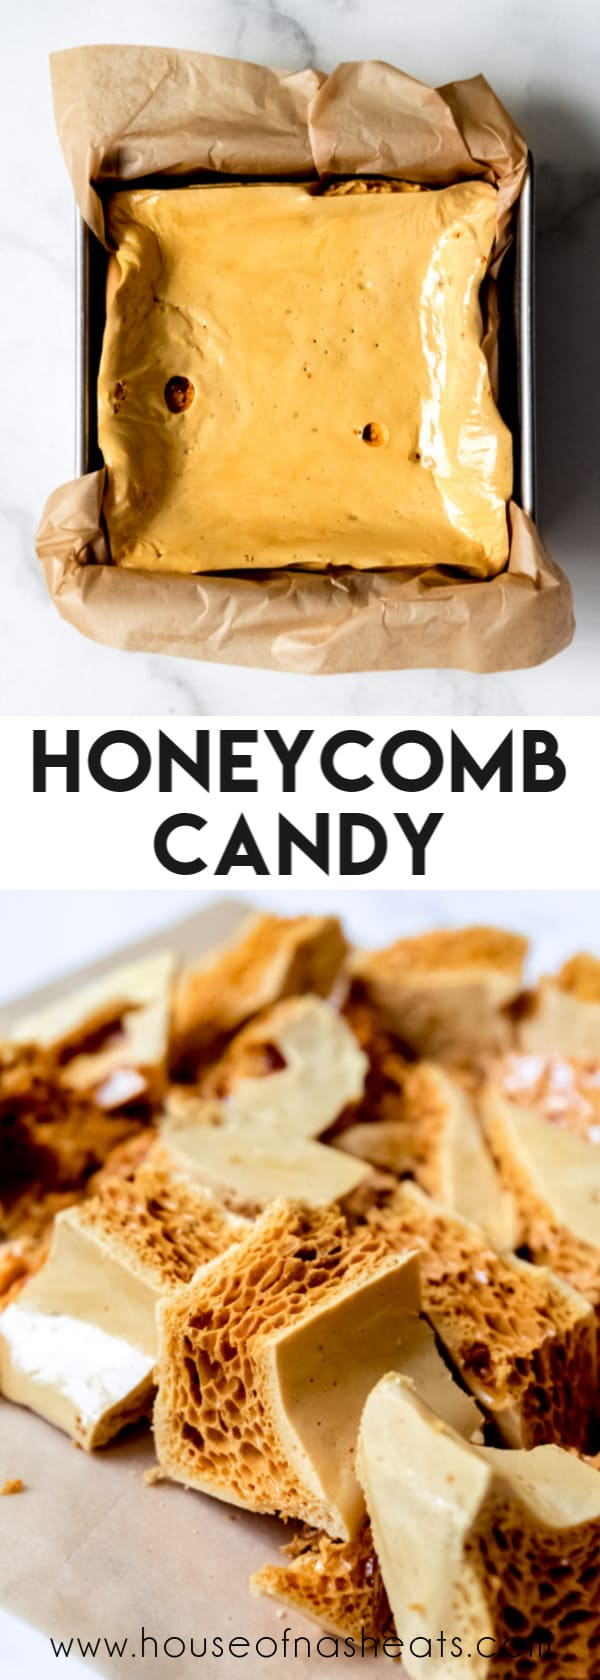 Photo of Honeycomb Recipe – House of Nash Eats